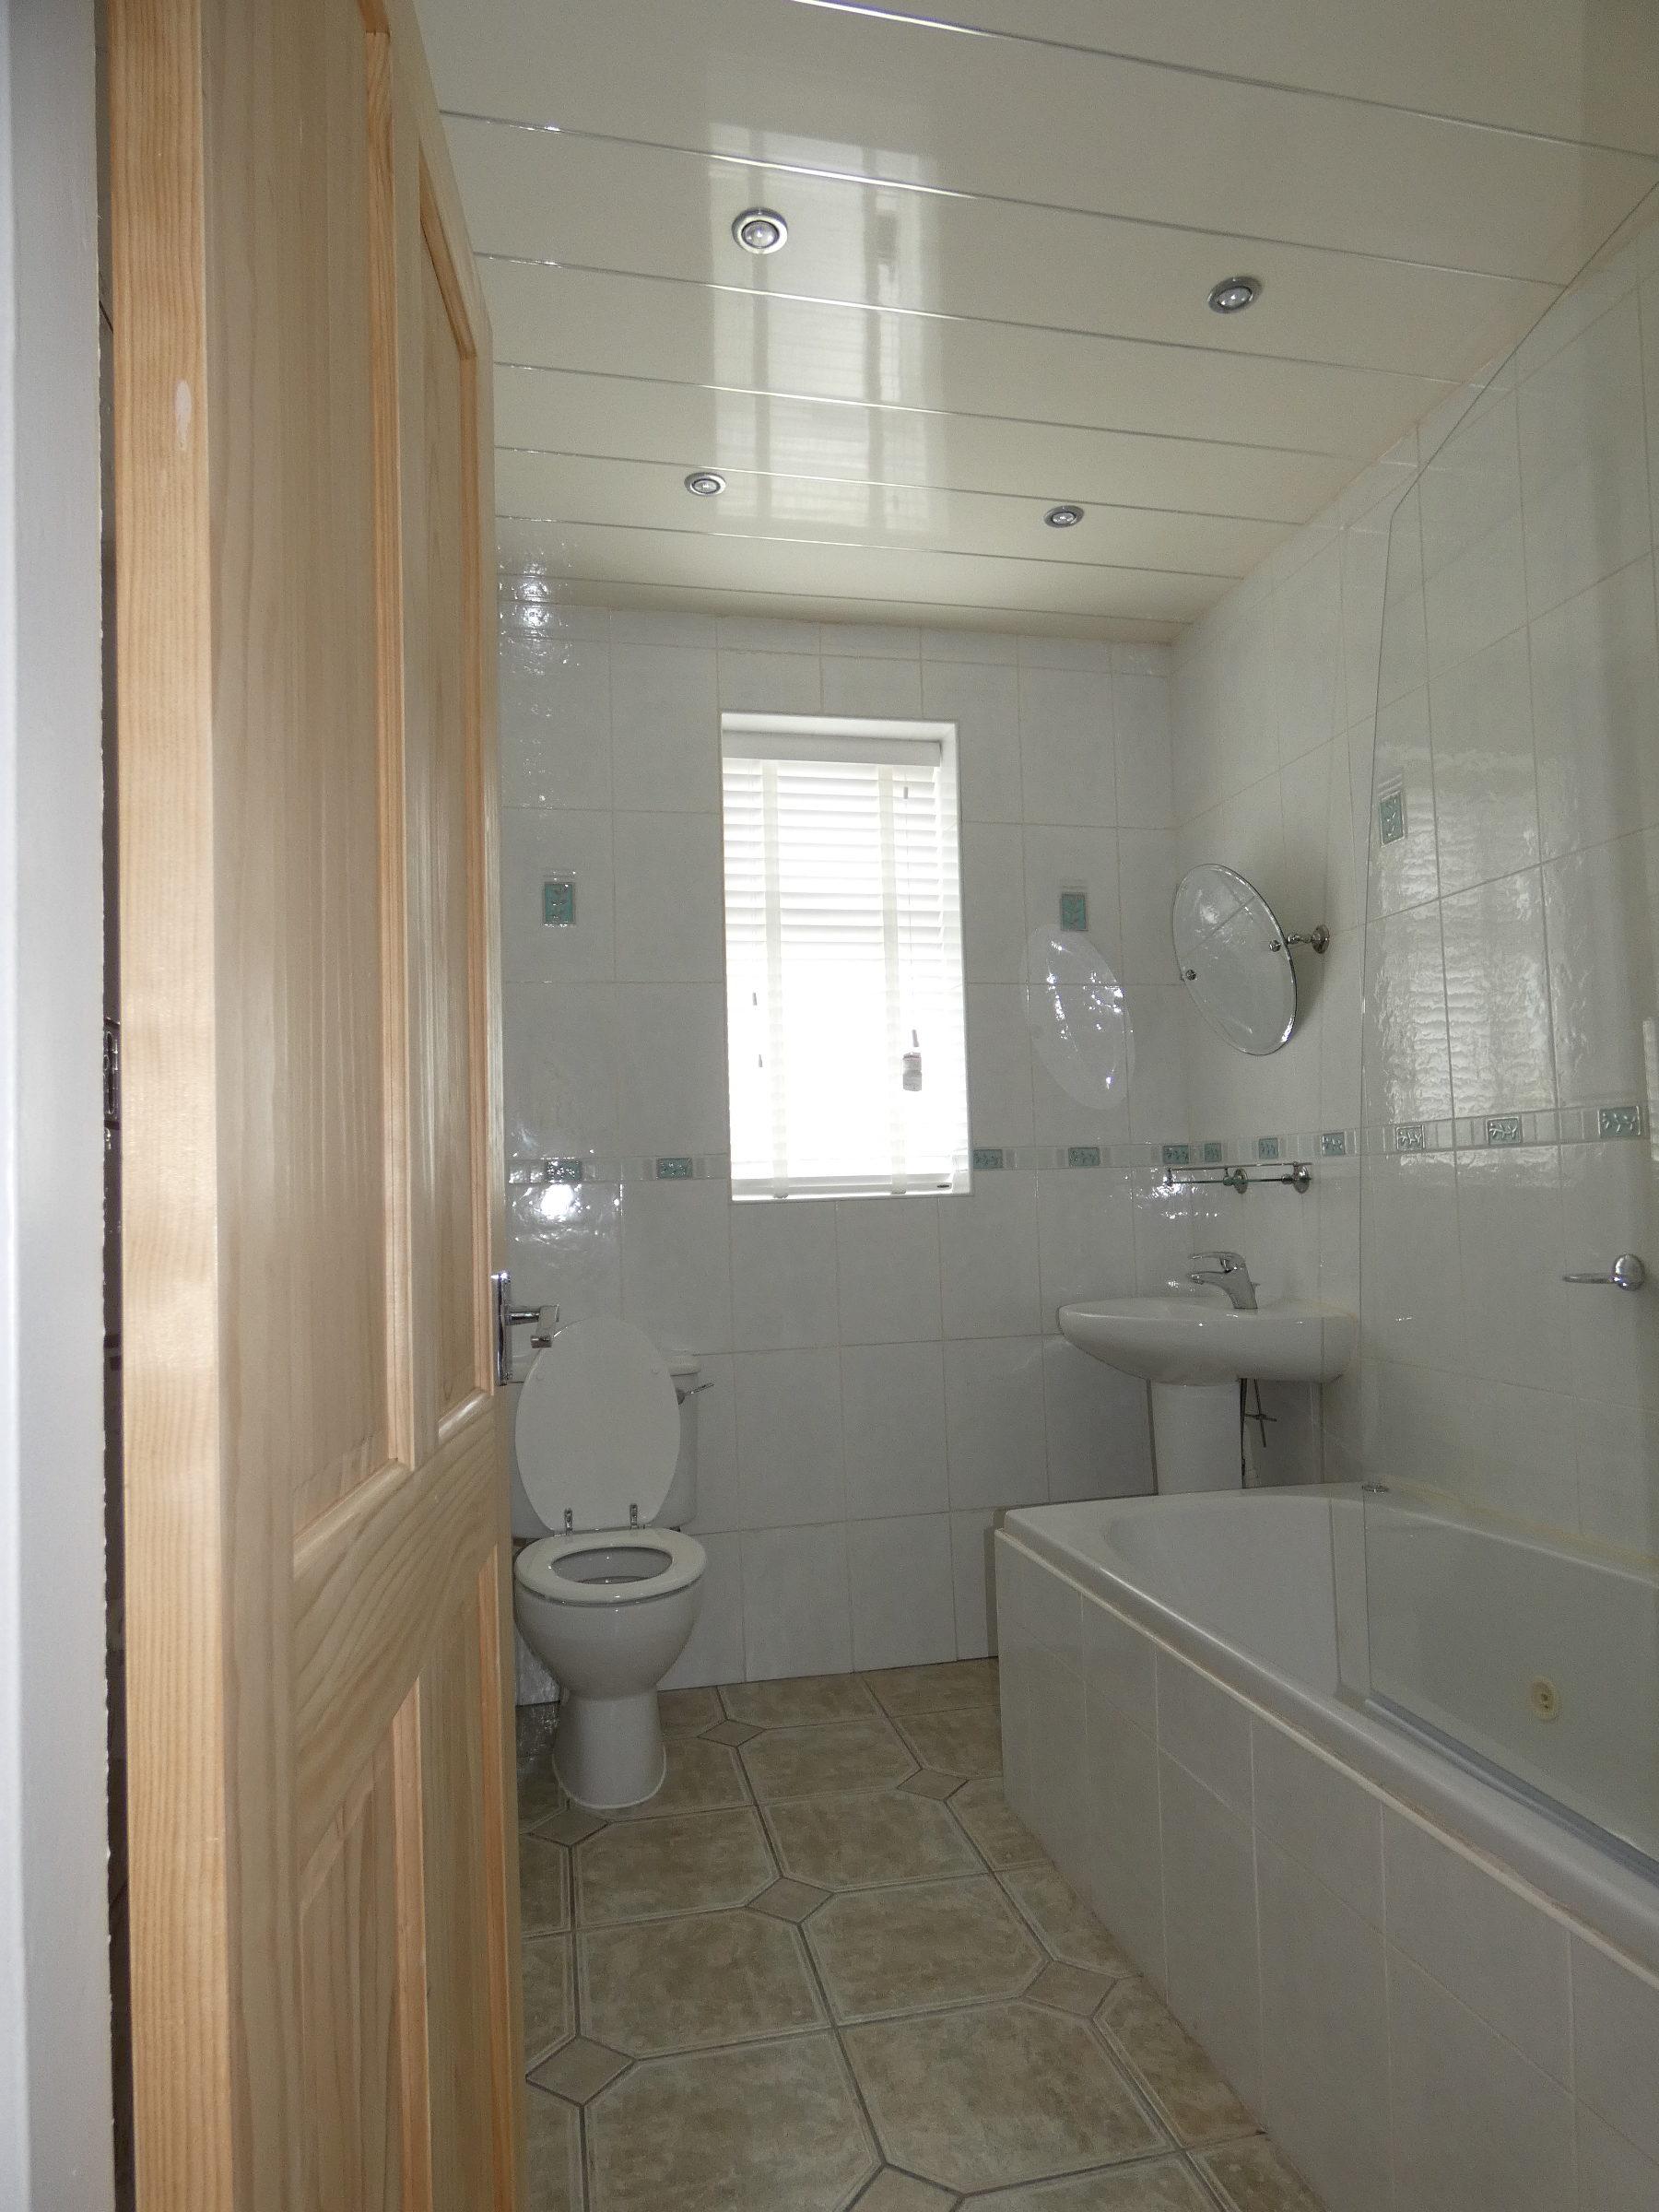 Denton_refurbishment_222-e1561492241657